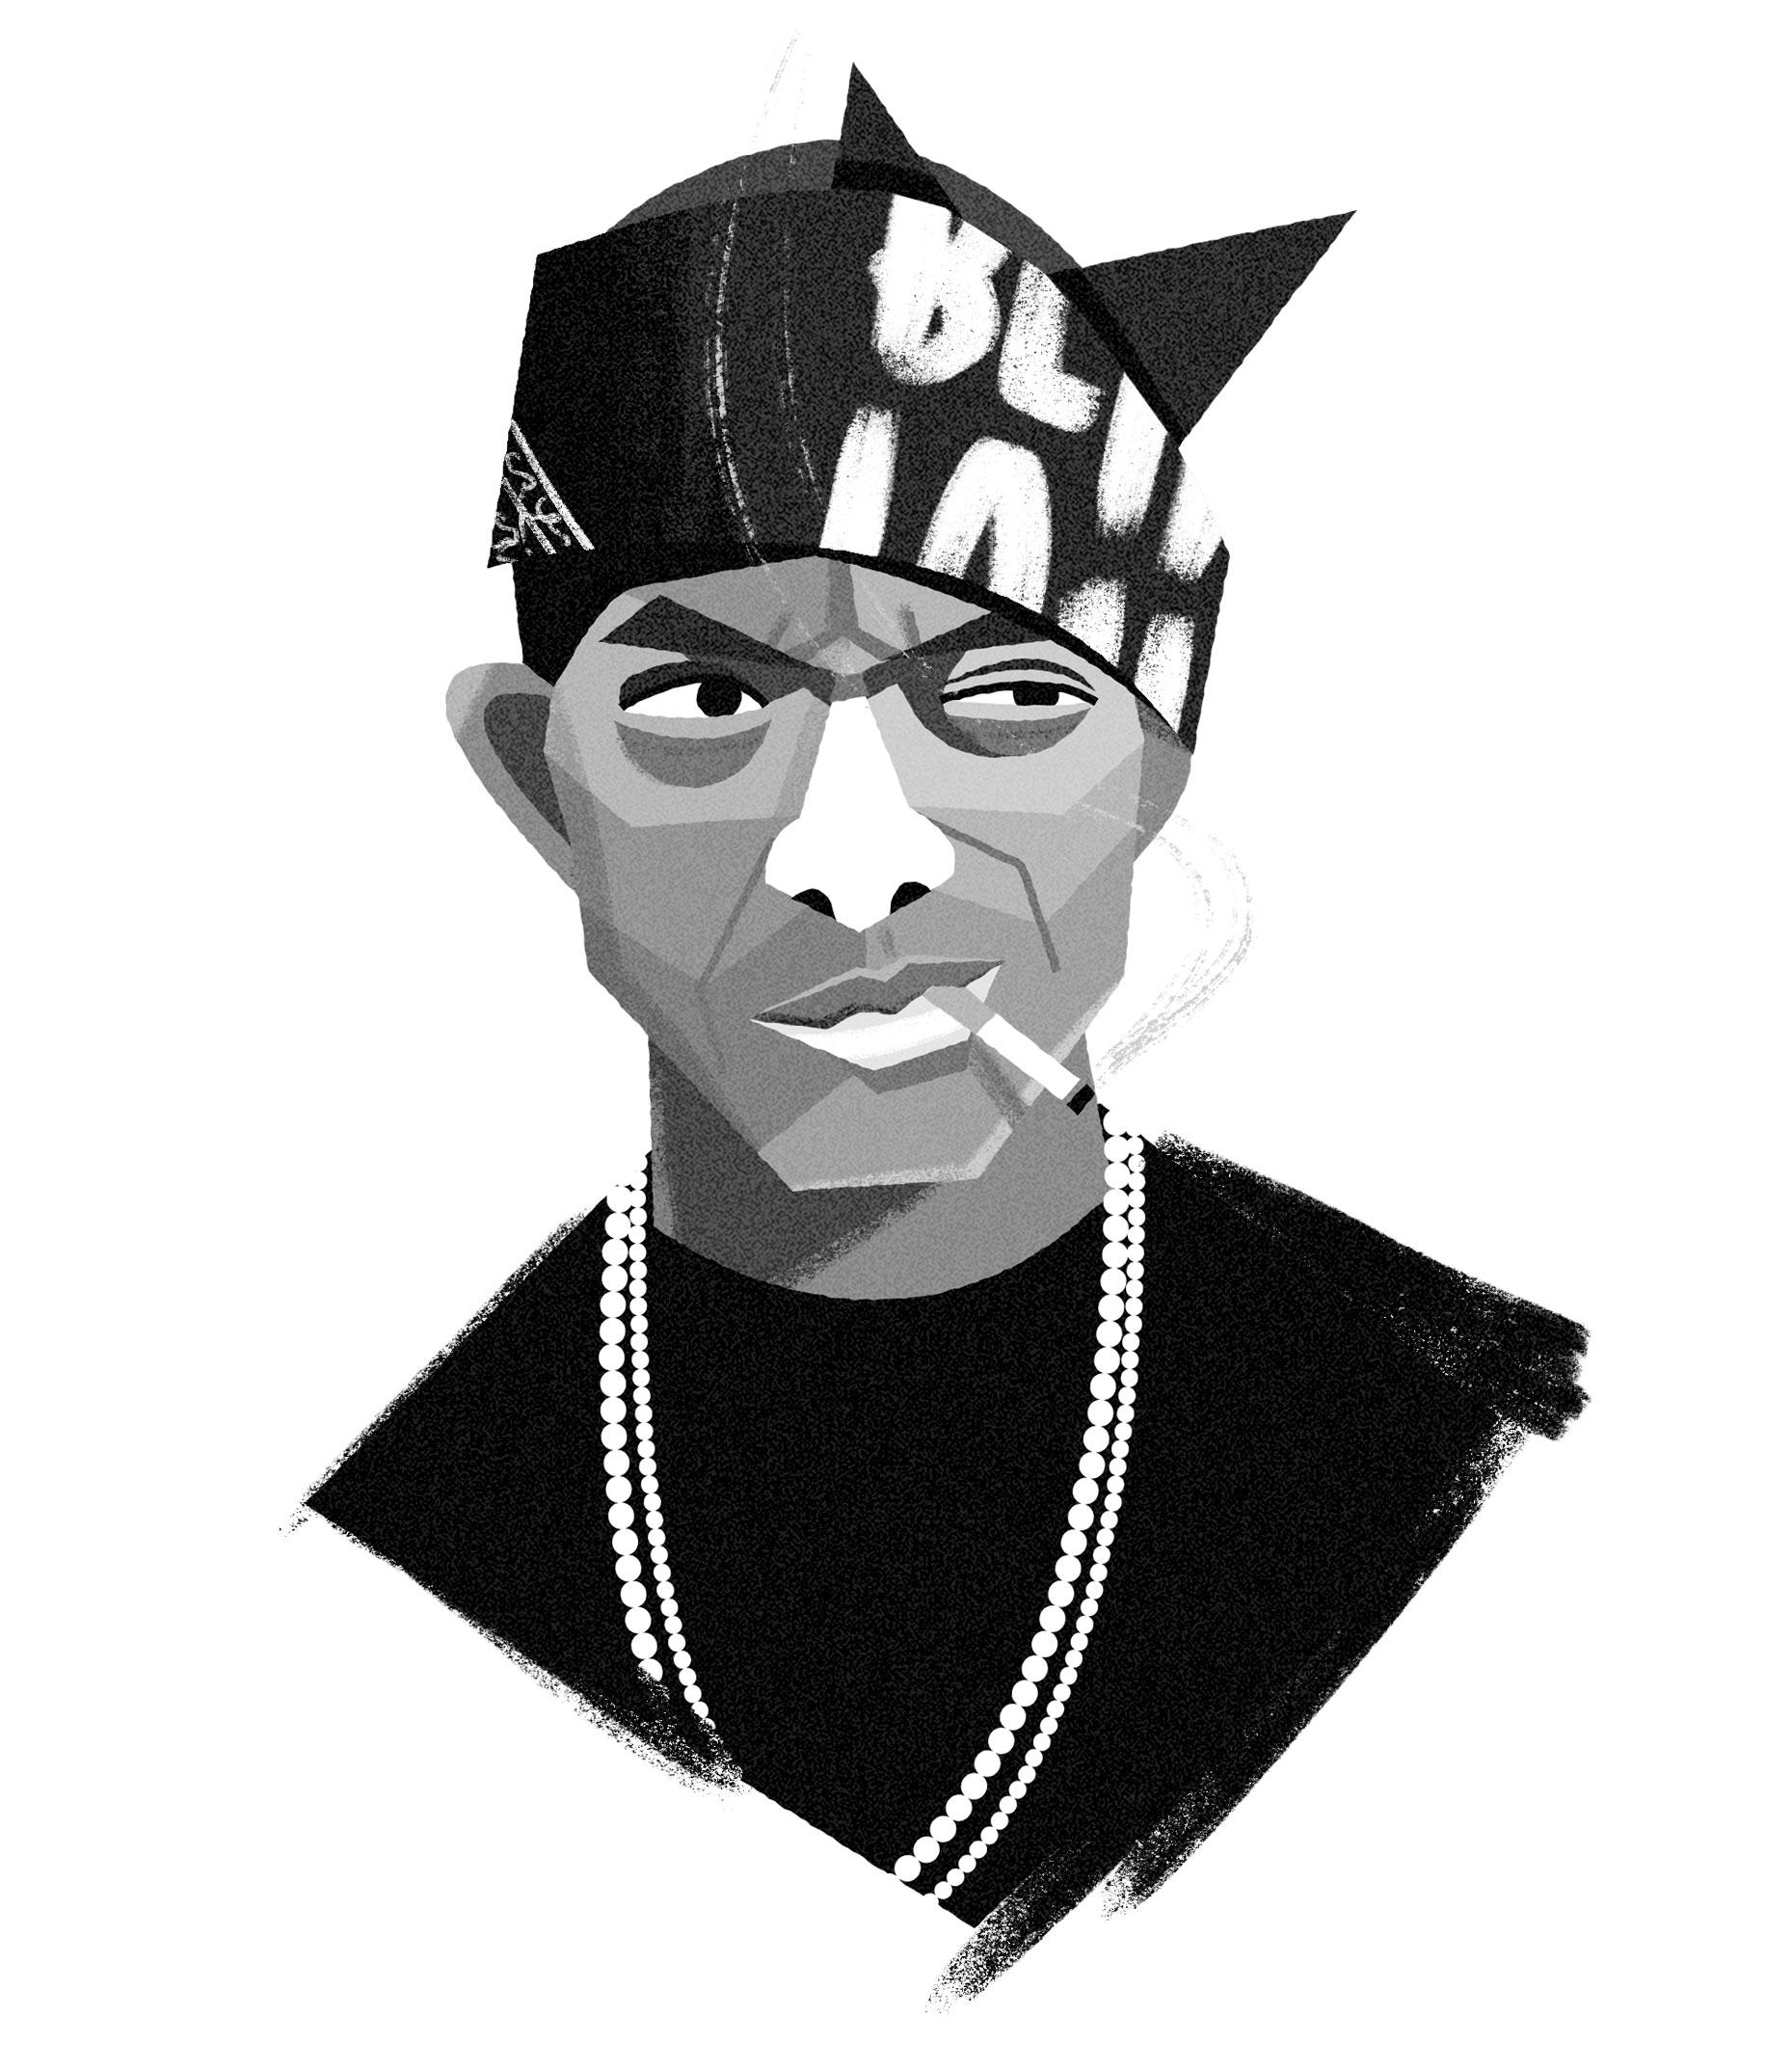 dale edwin murray freelance illustrator personal prodigy portrait illustration